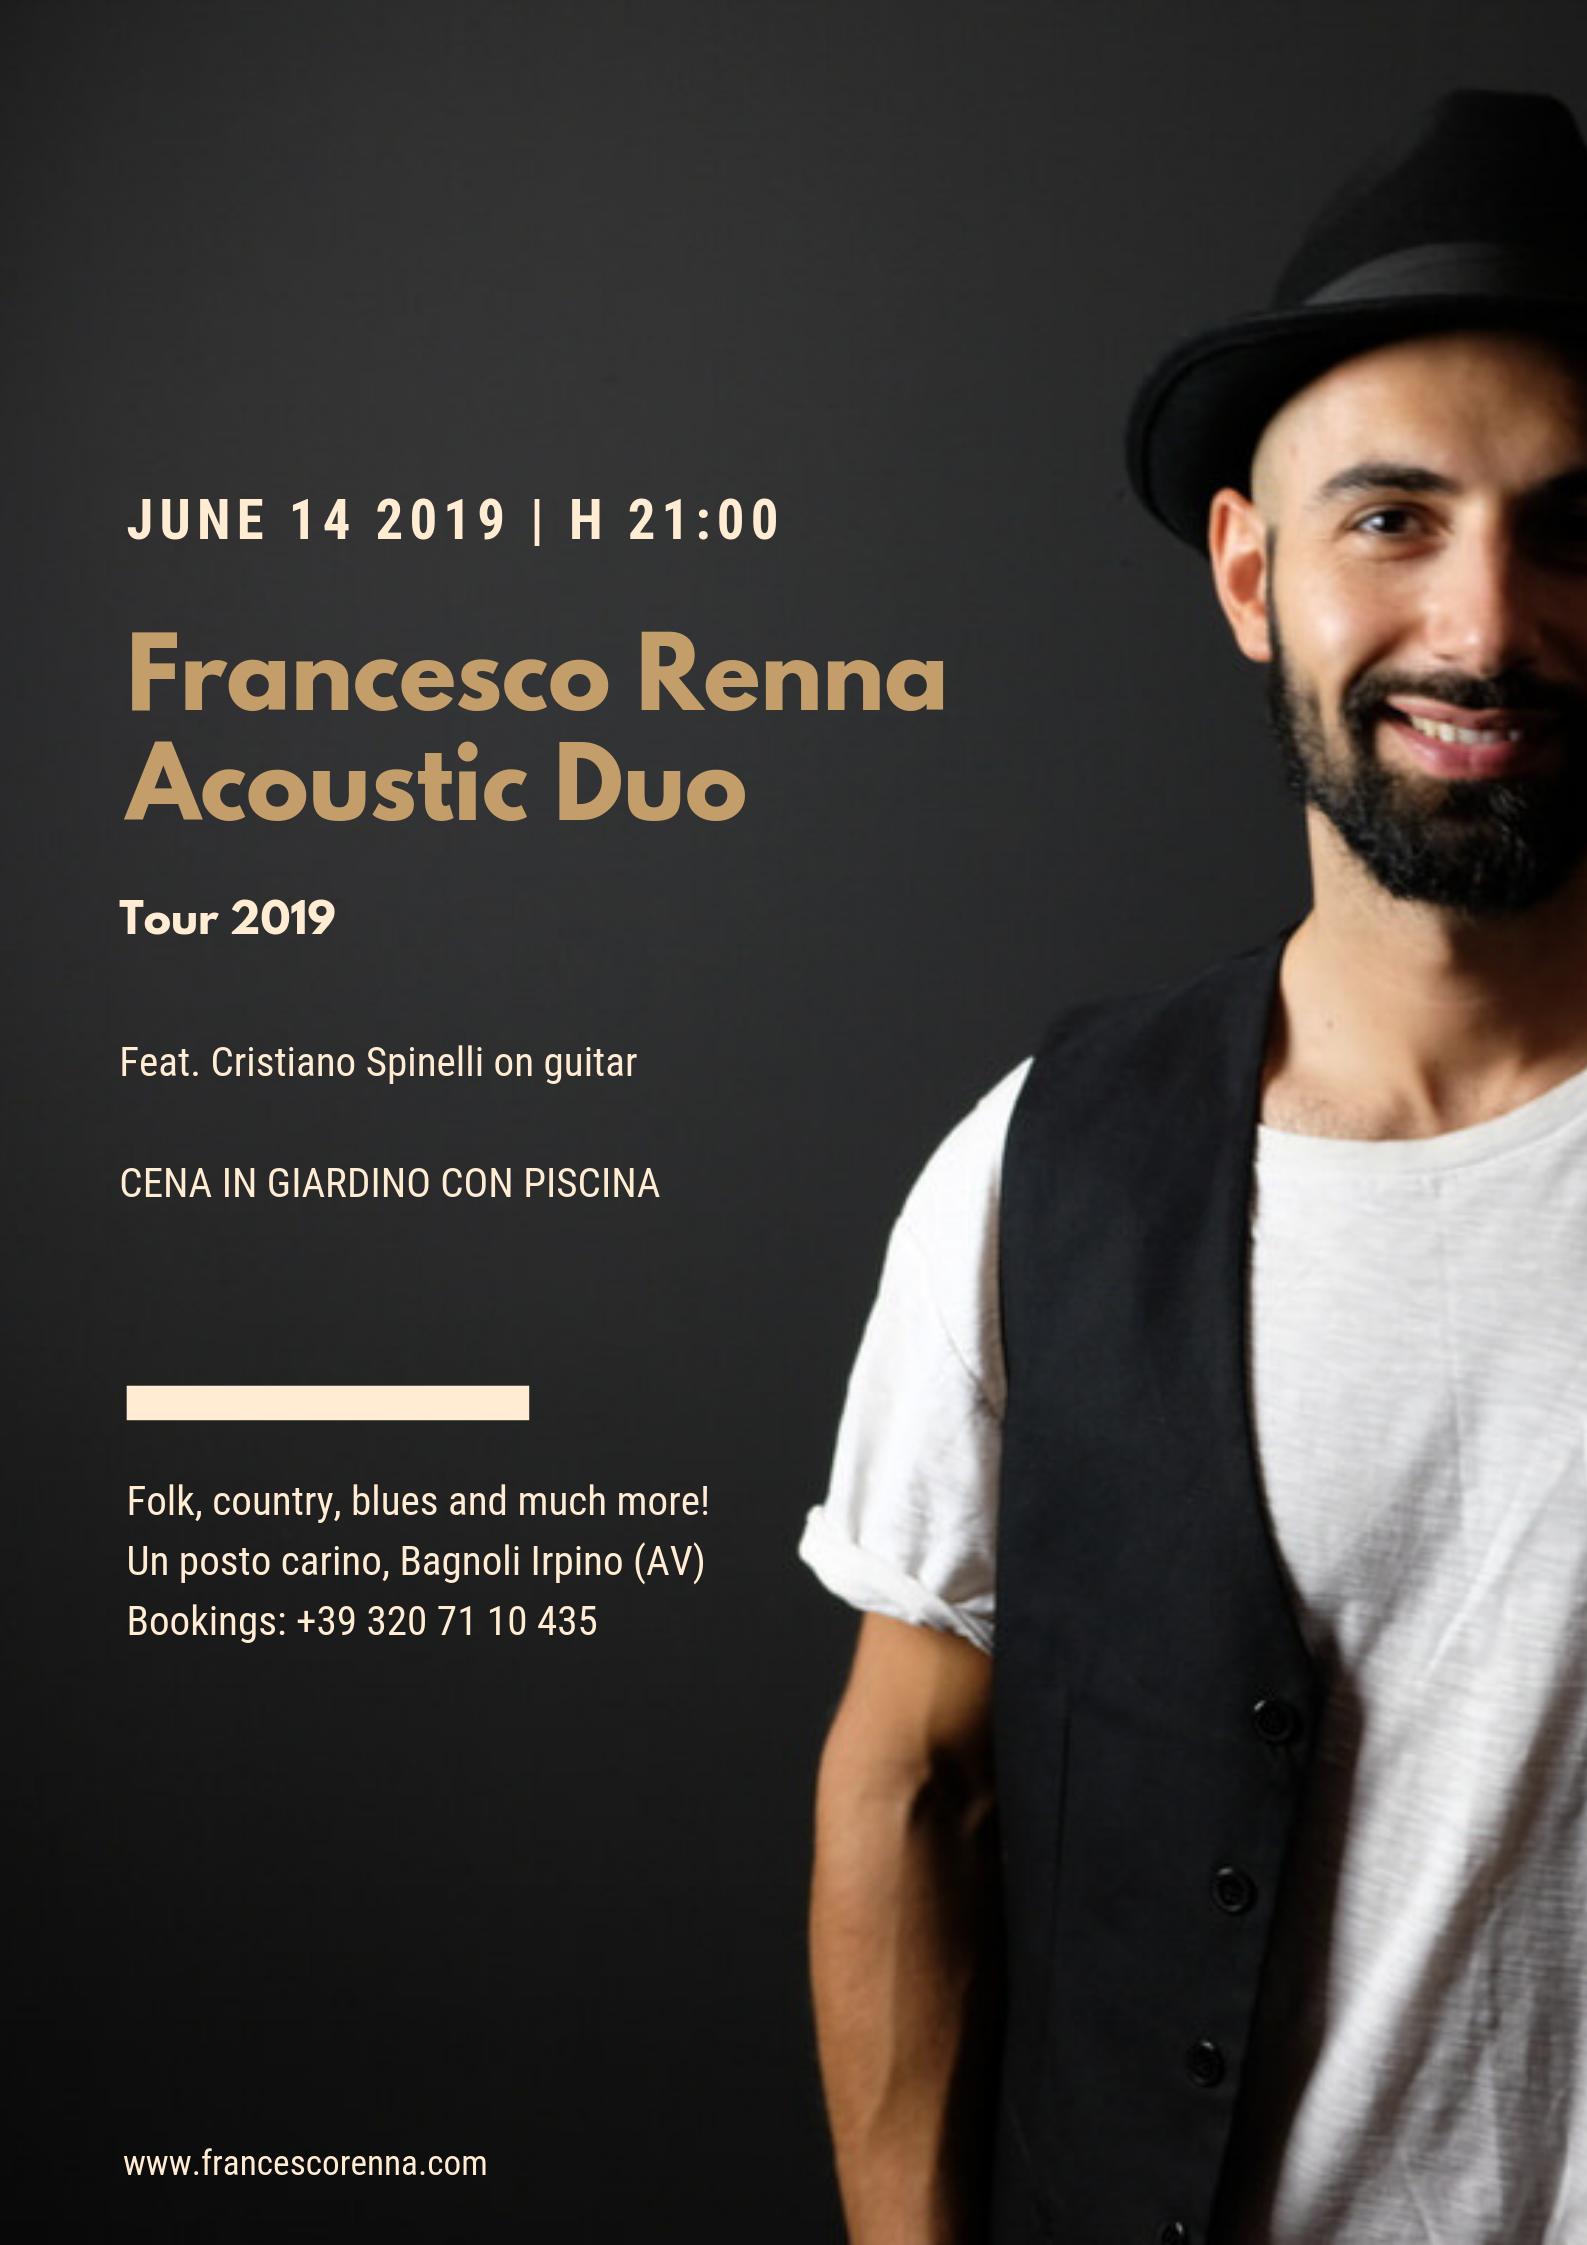 Francesco Renna duo live a Un Posto Carino, Bagnoli Irpino (AV)